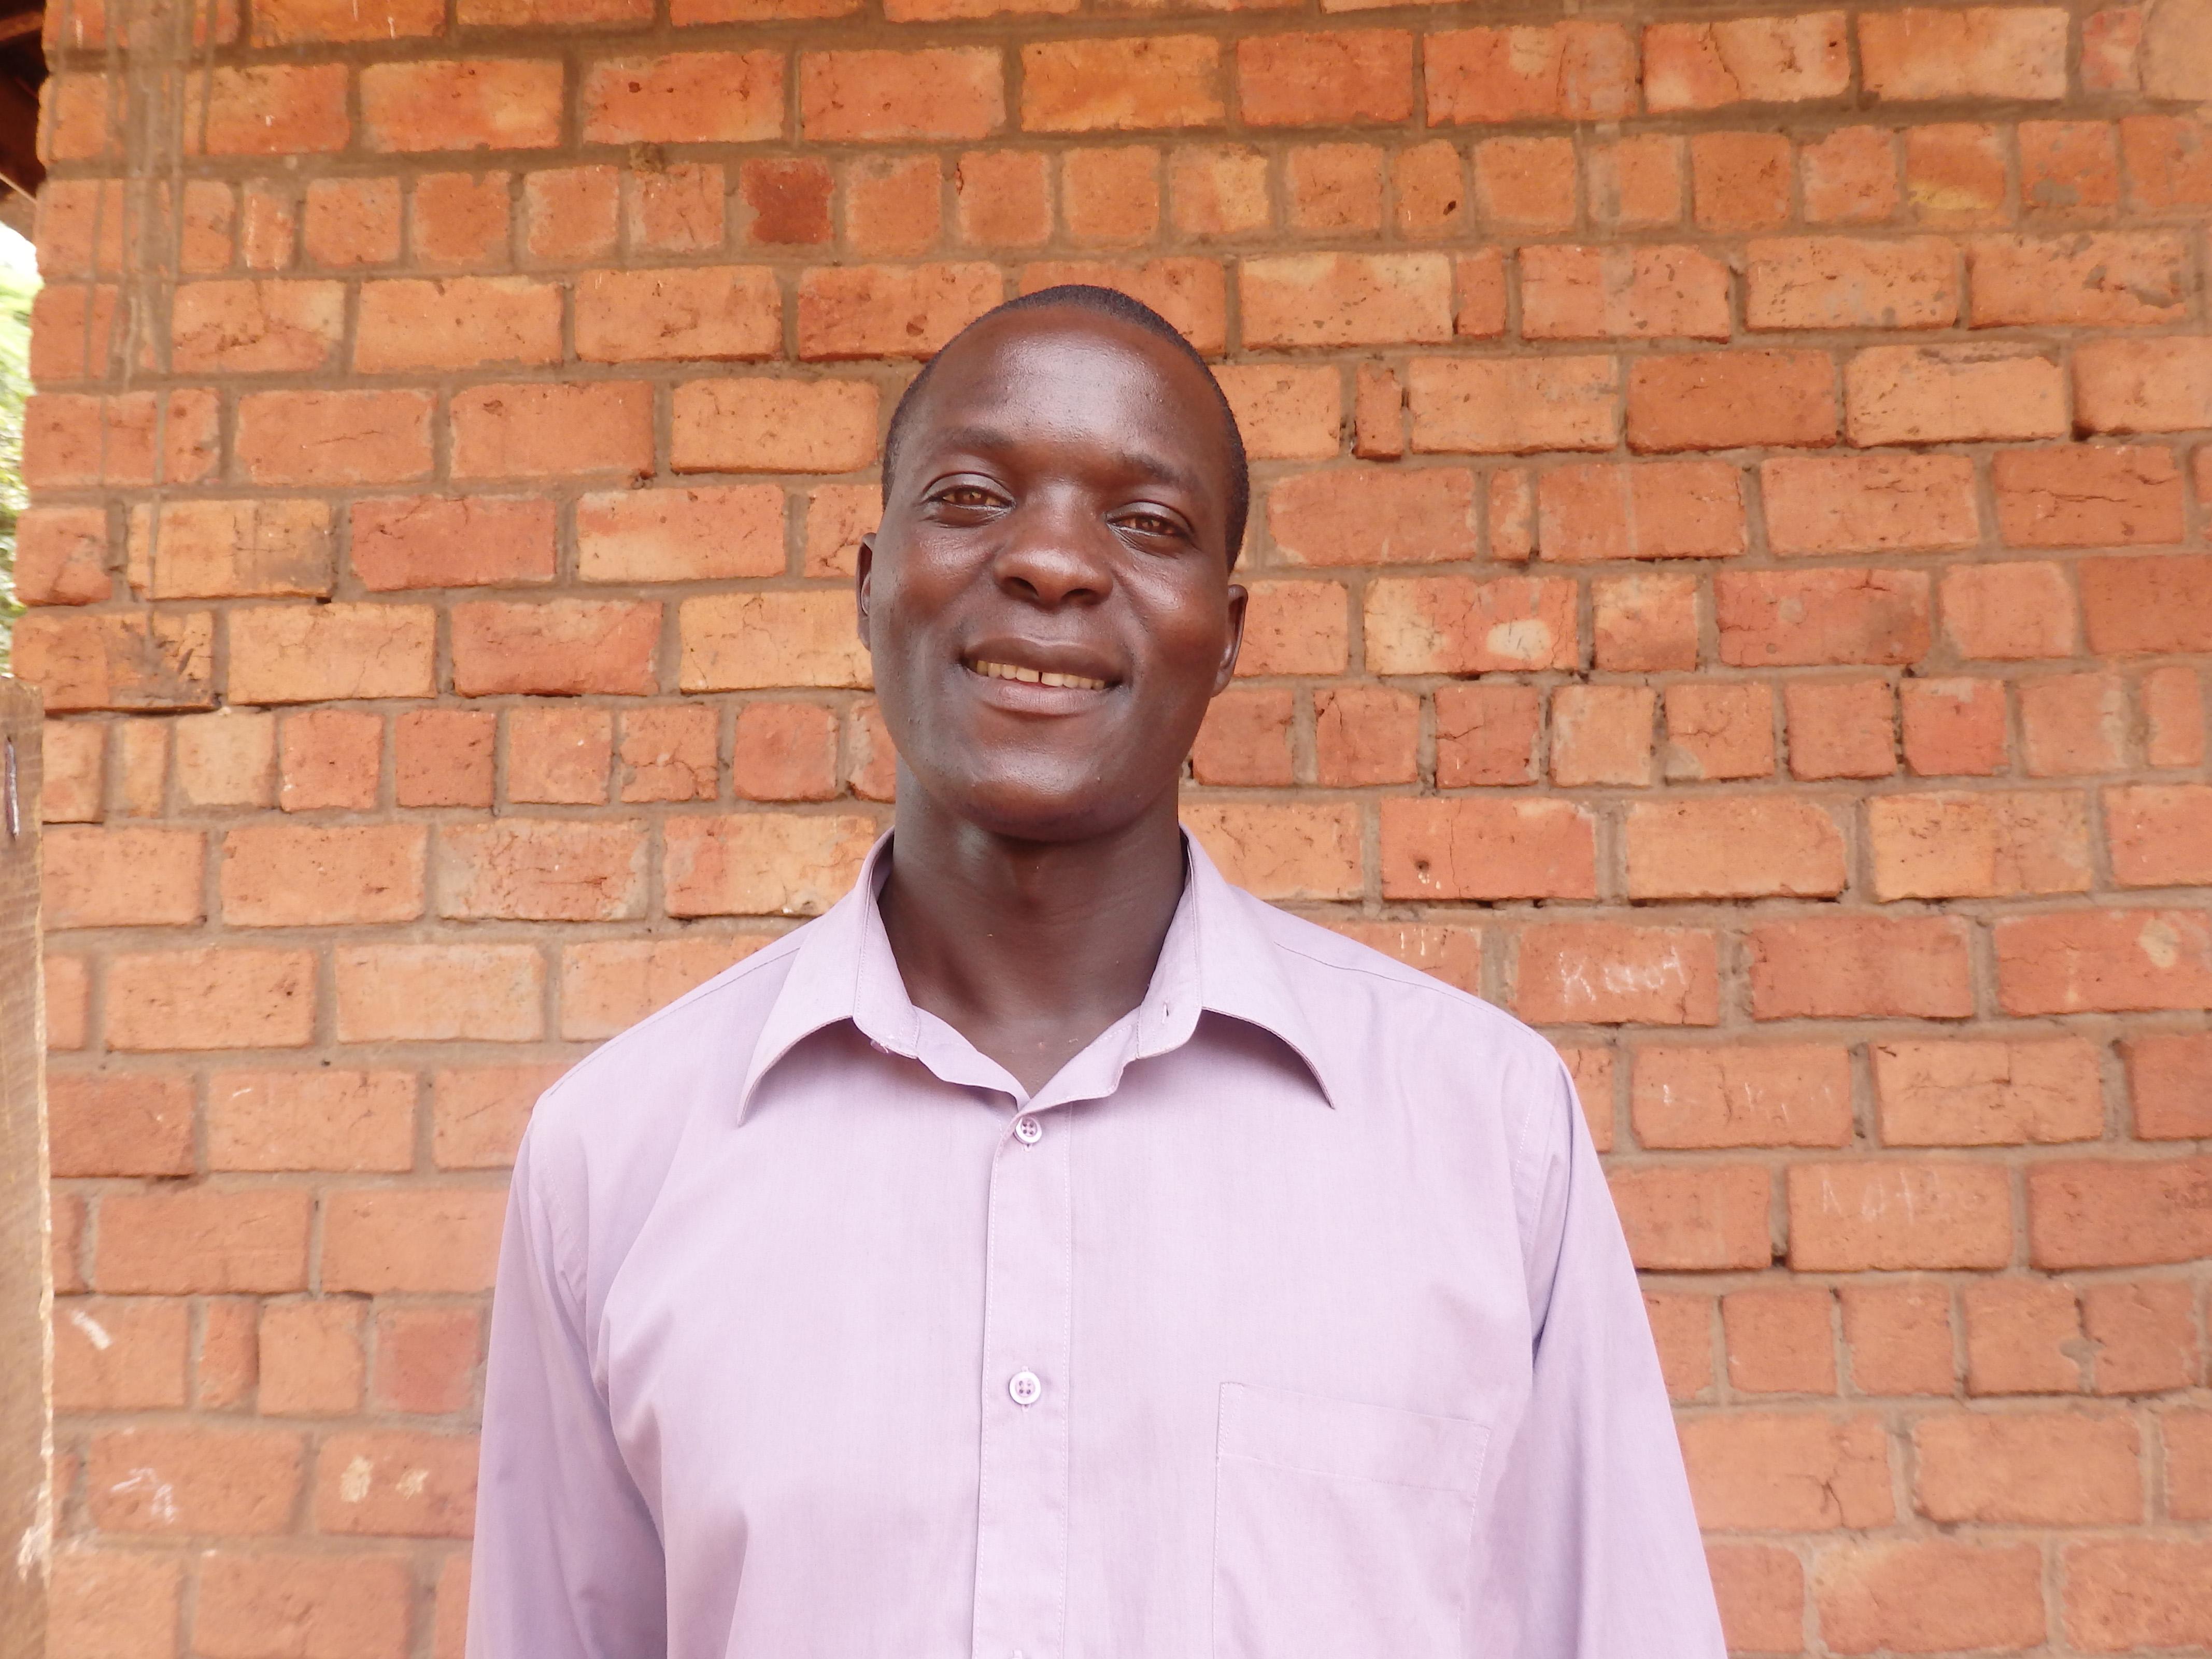 Godfrey Zalambi